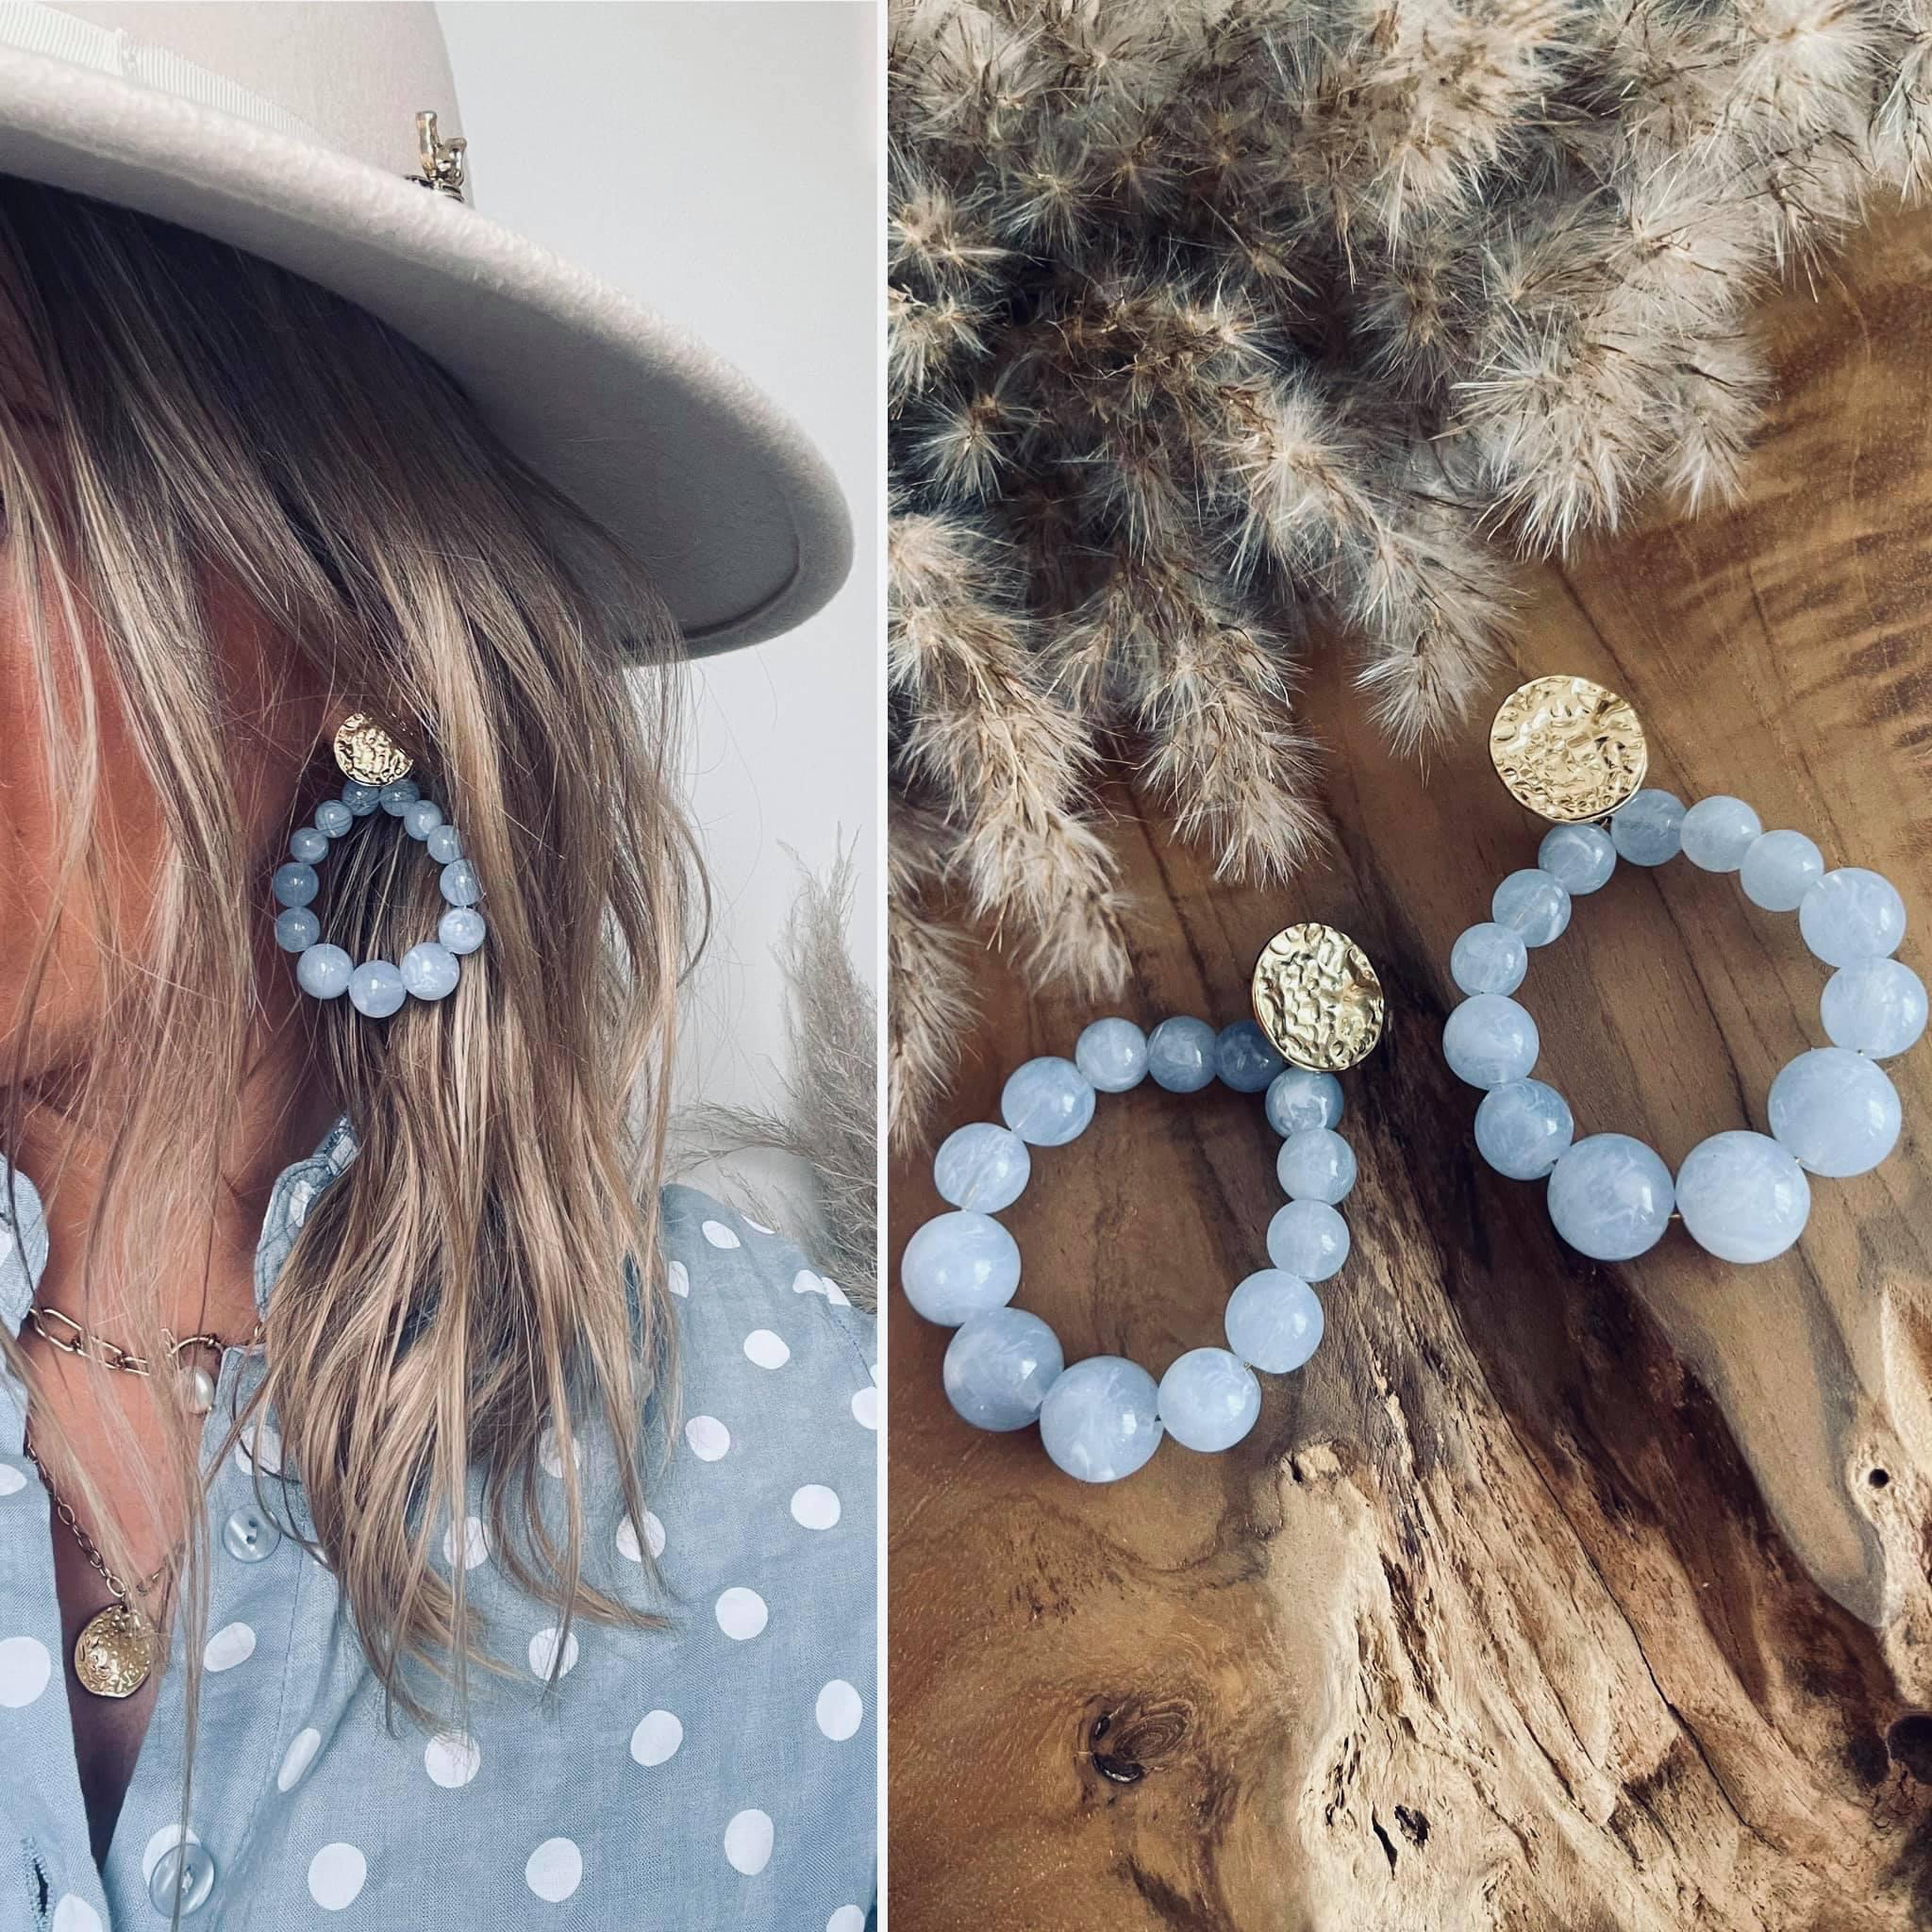 Boucles perles bleu jean en ACIER inoxydable